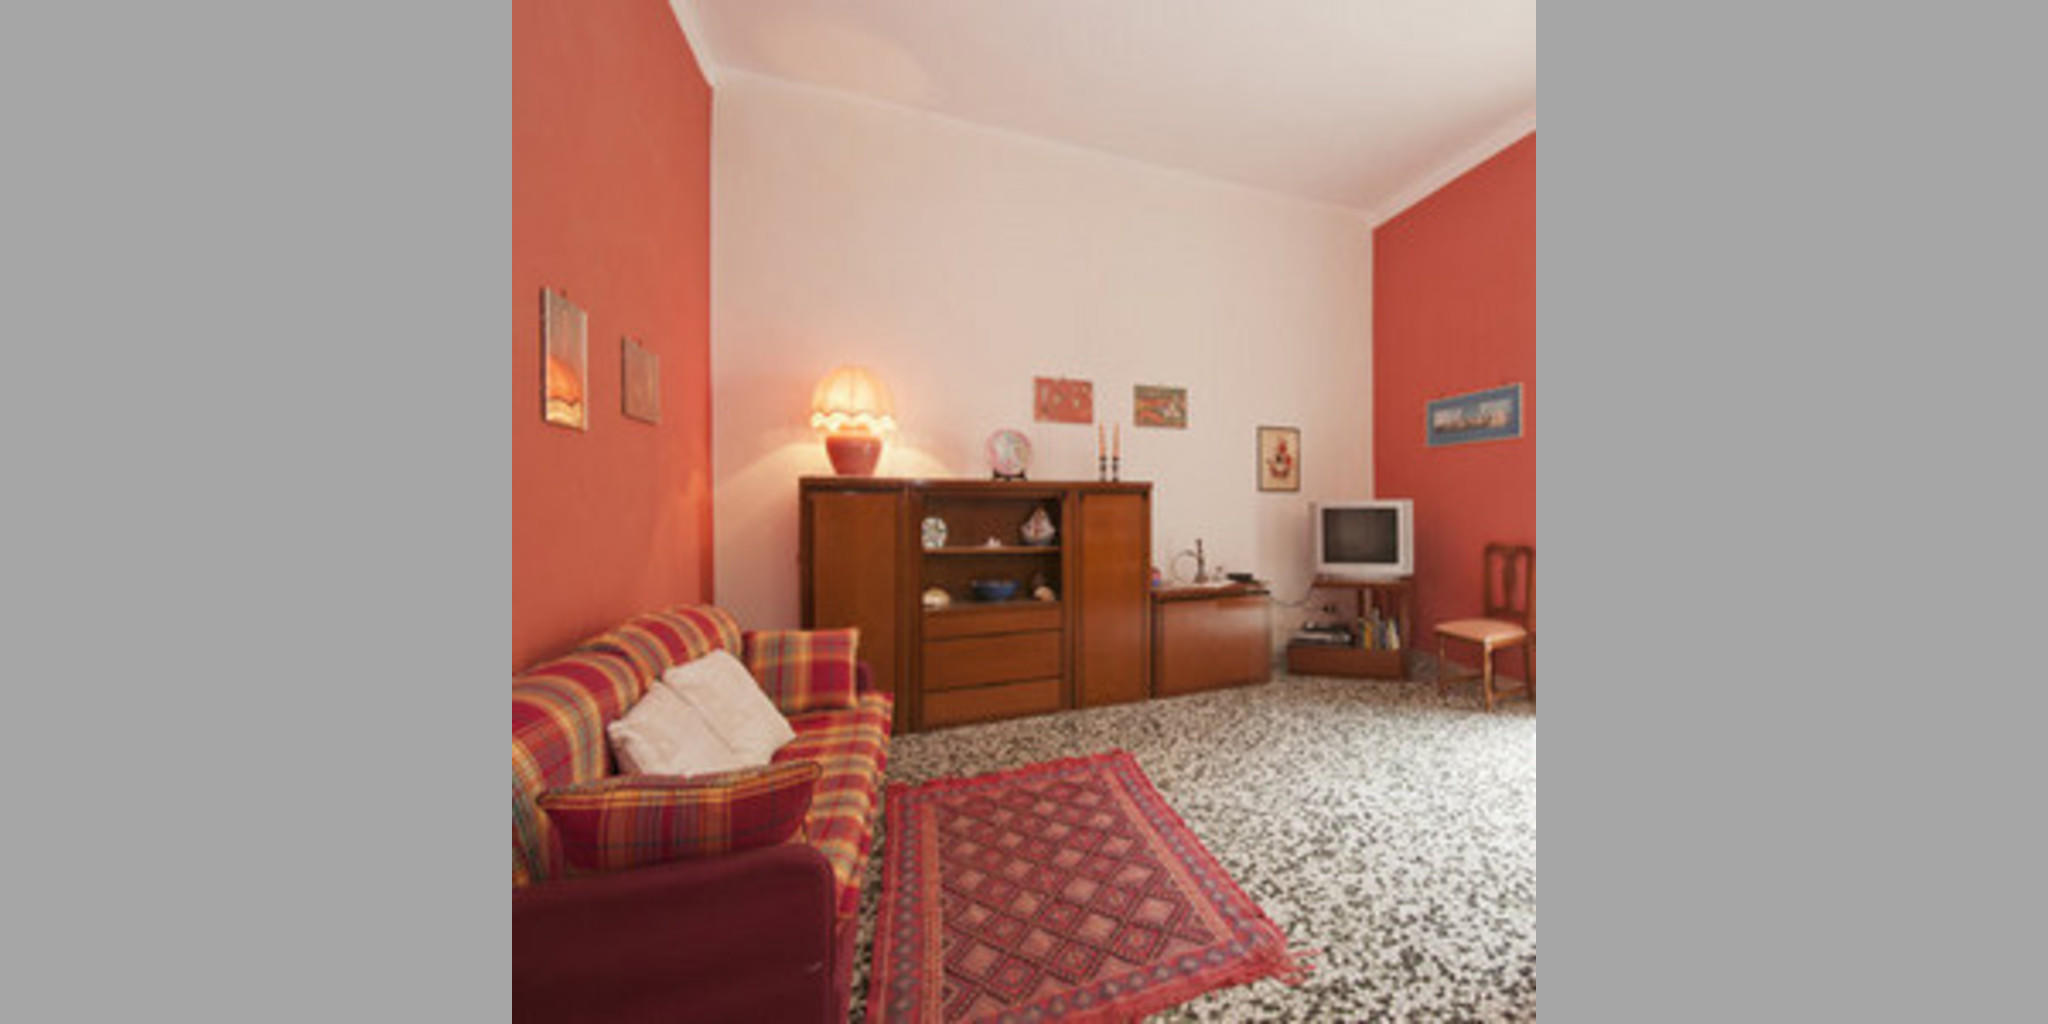 Apartment Trani - Statuti Marittimi